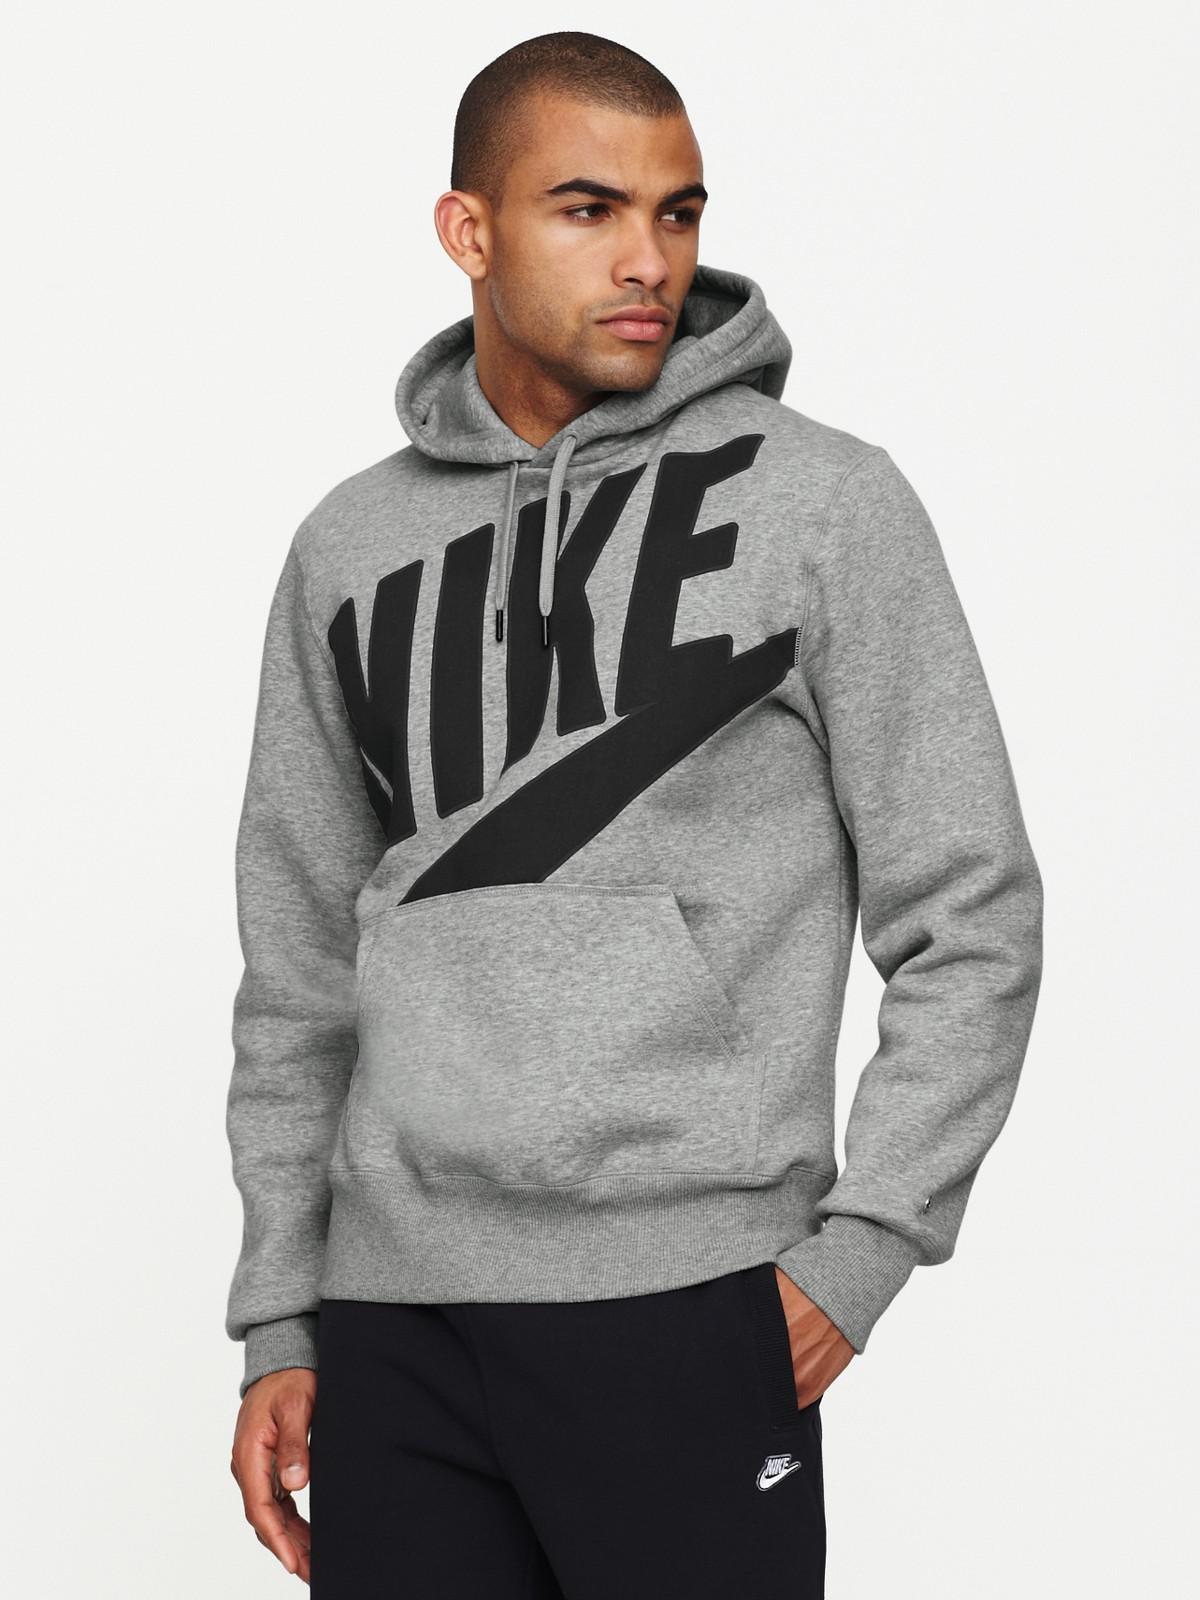 Nike Limitless Hoodie in Gray for Men (grey_marl) | Lyst